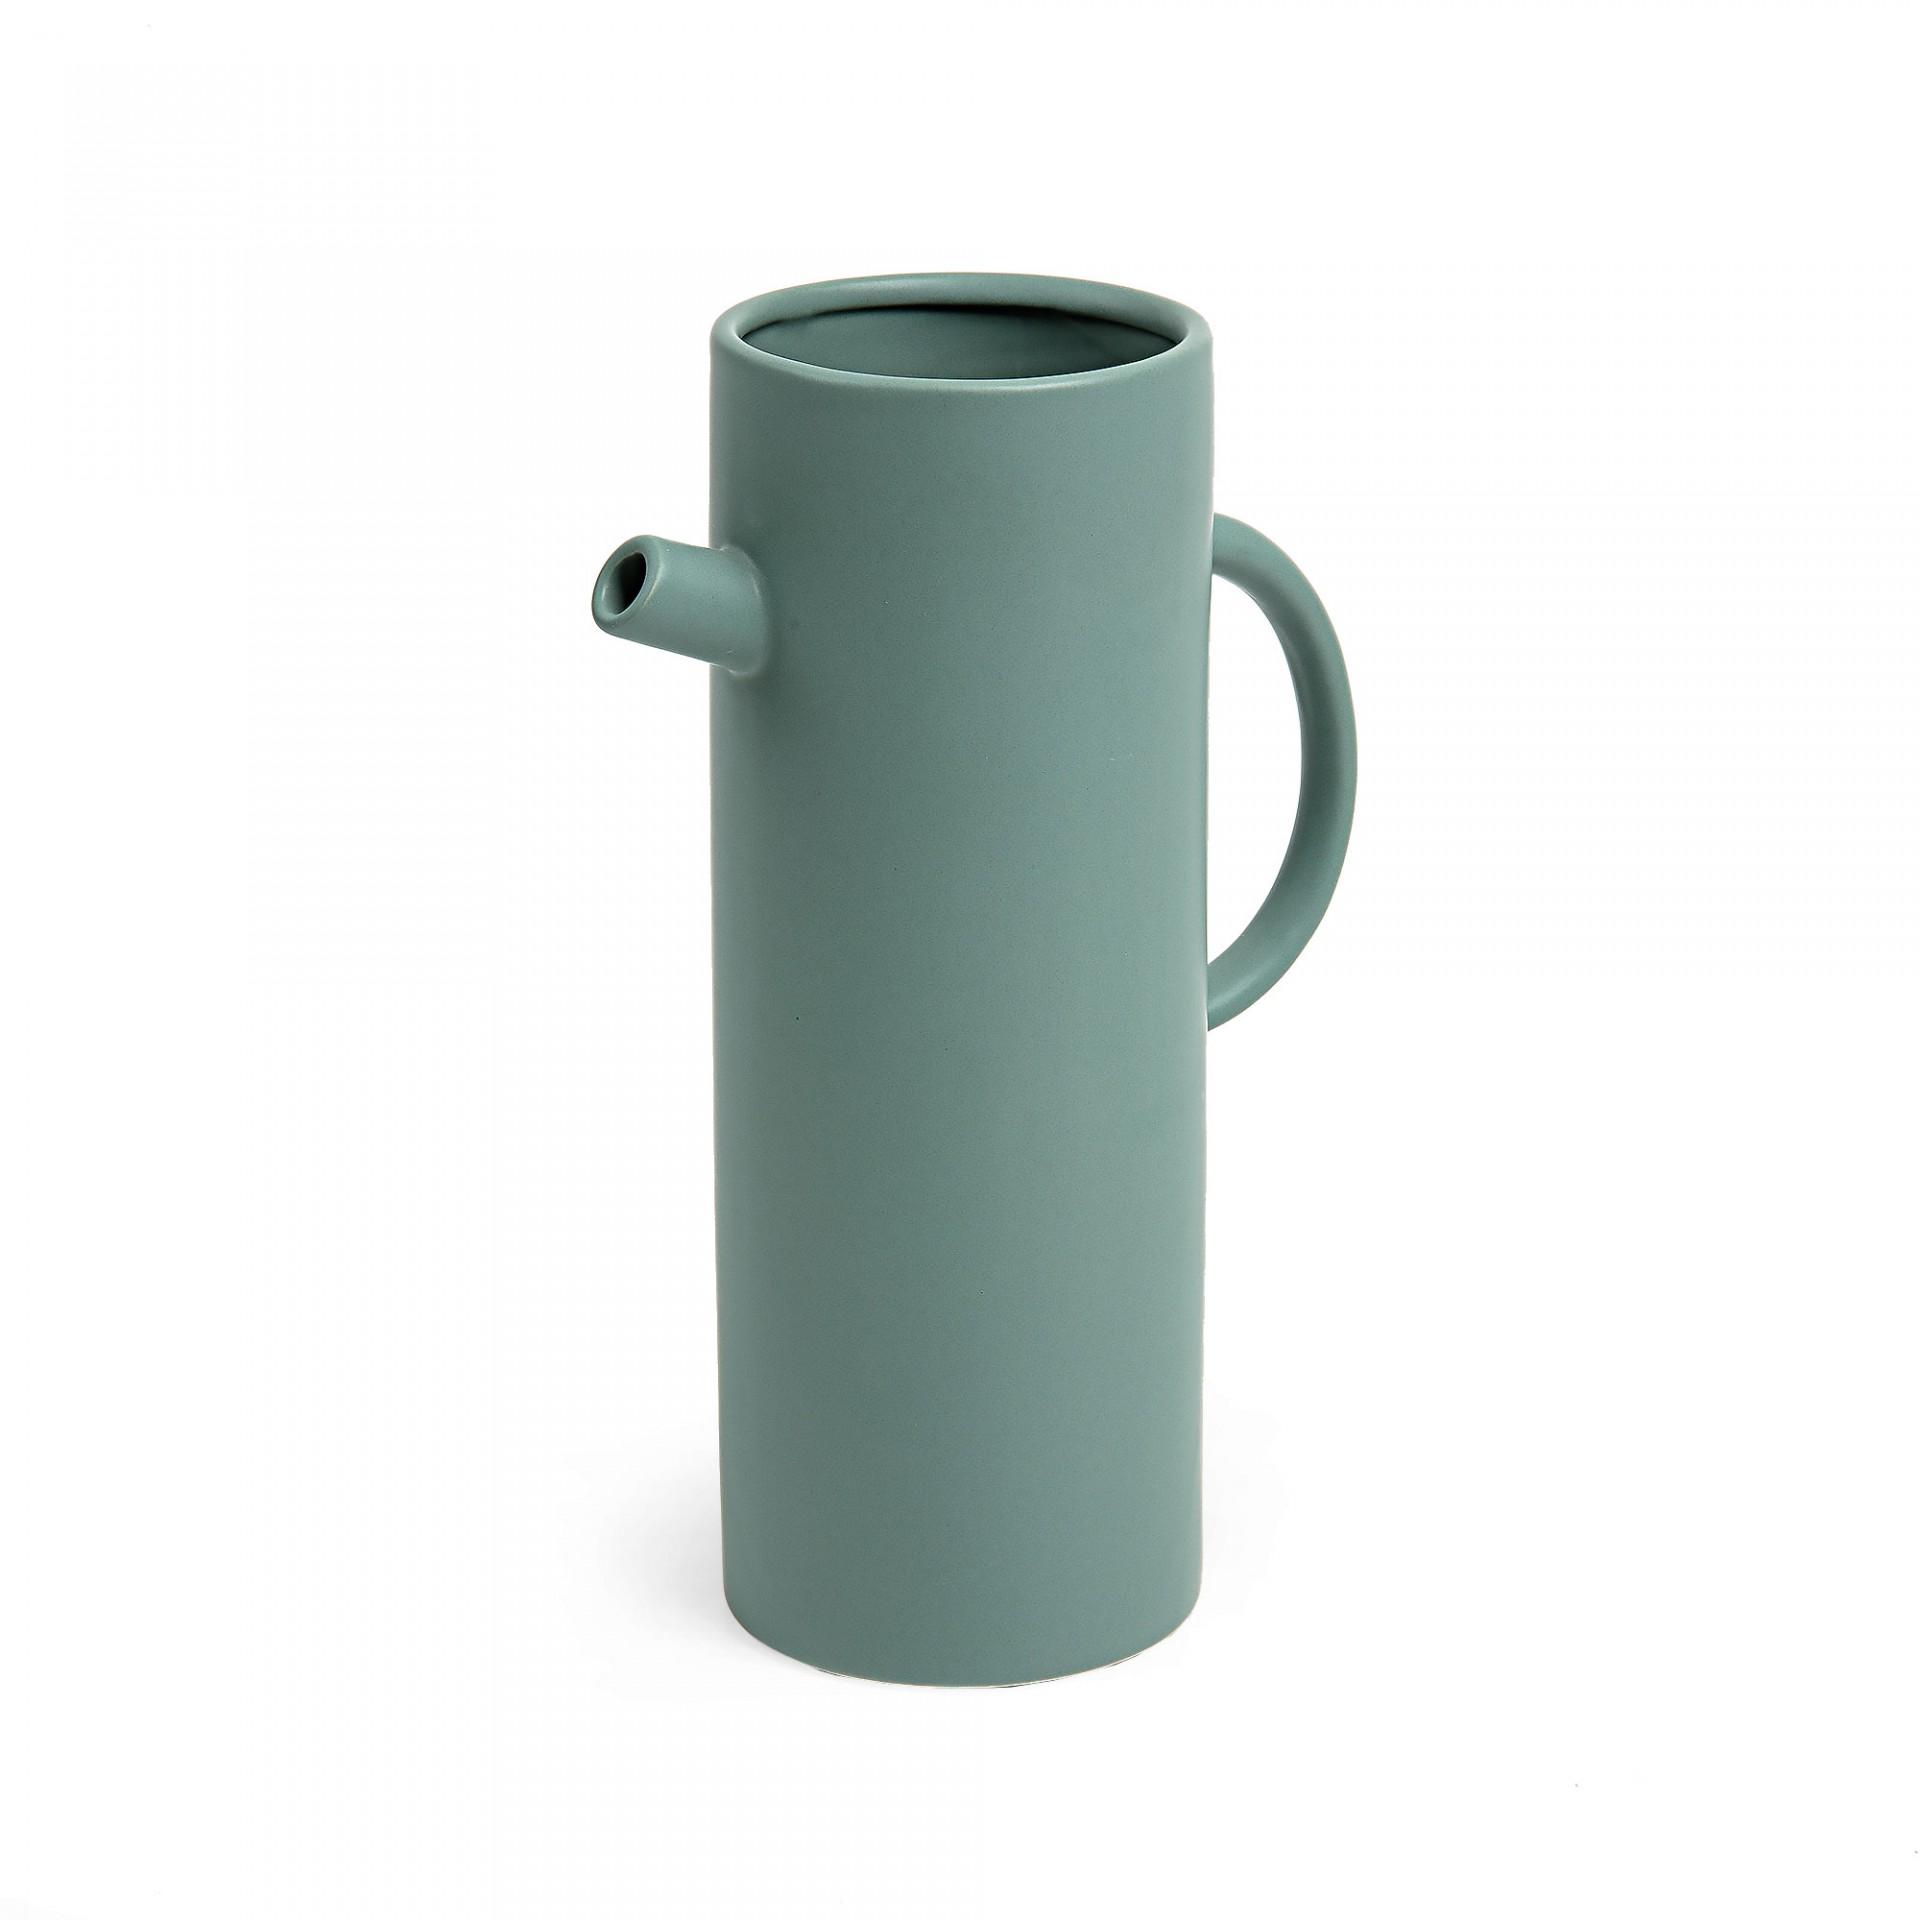 Jarra Hermi, cerâmica, verde fosco, Ø18x30